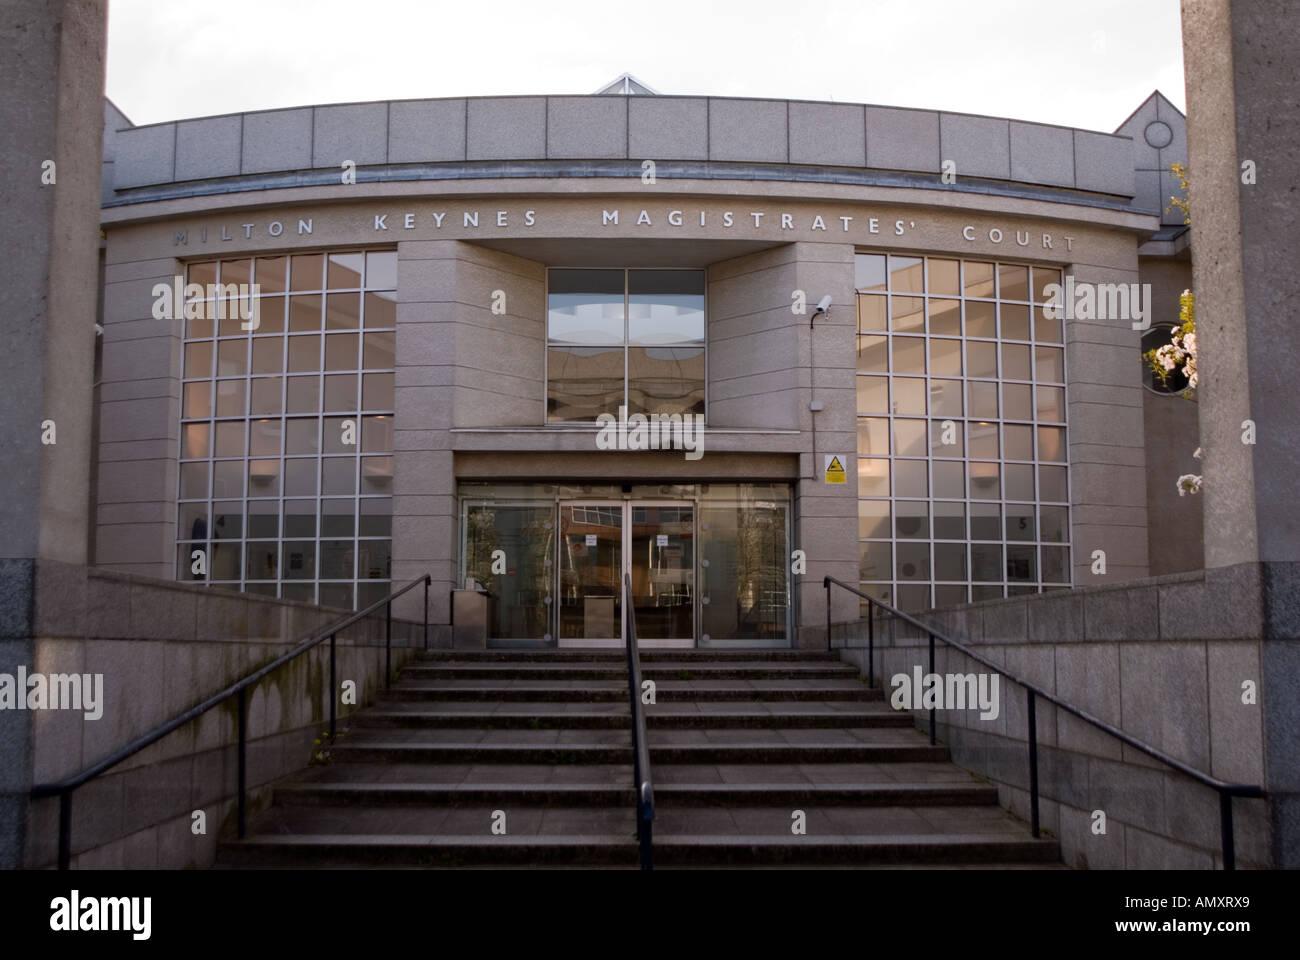 City of Milton Keynes Magistrates Court - Stock Image